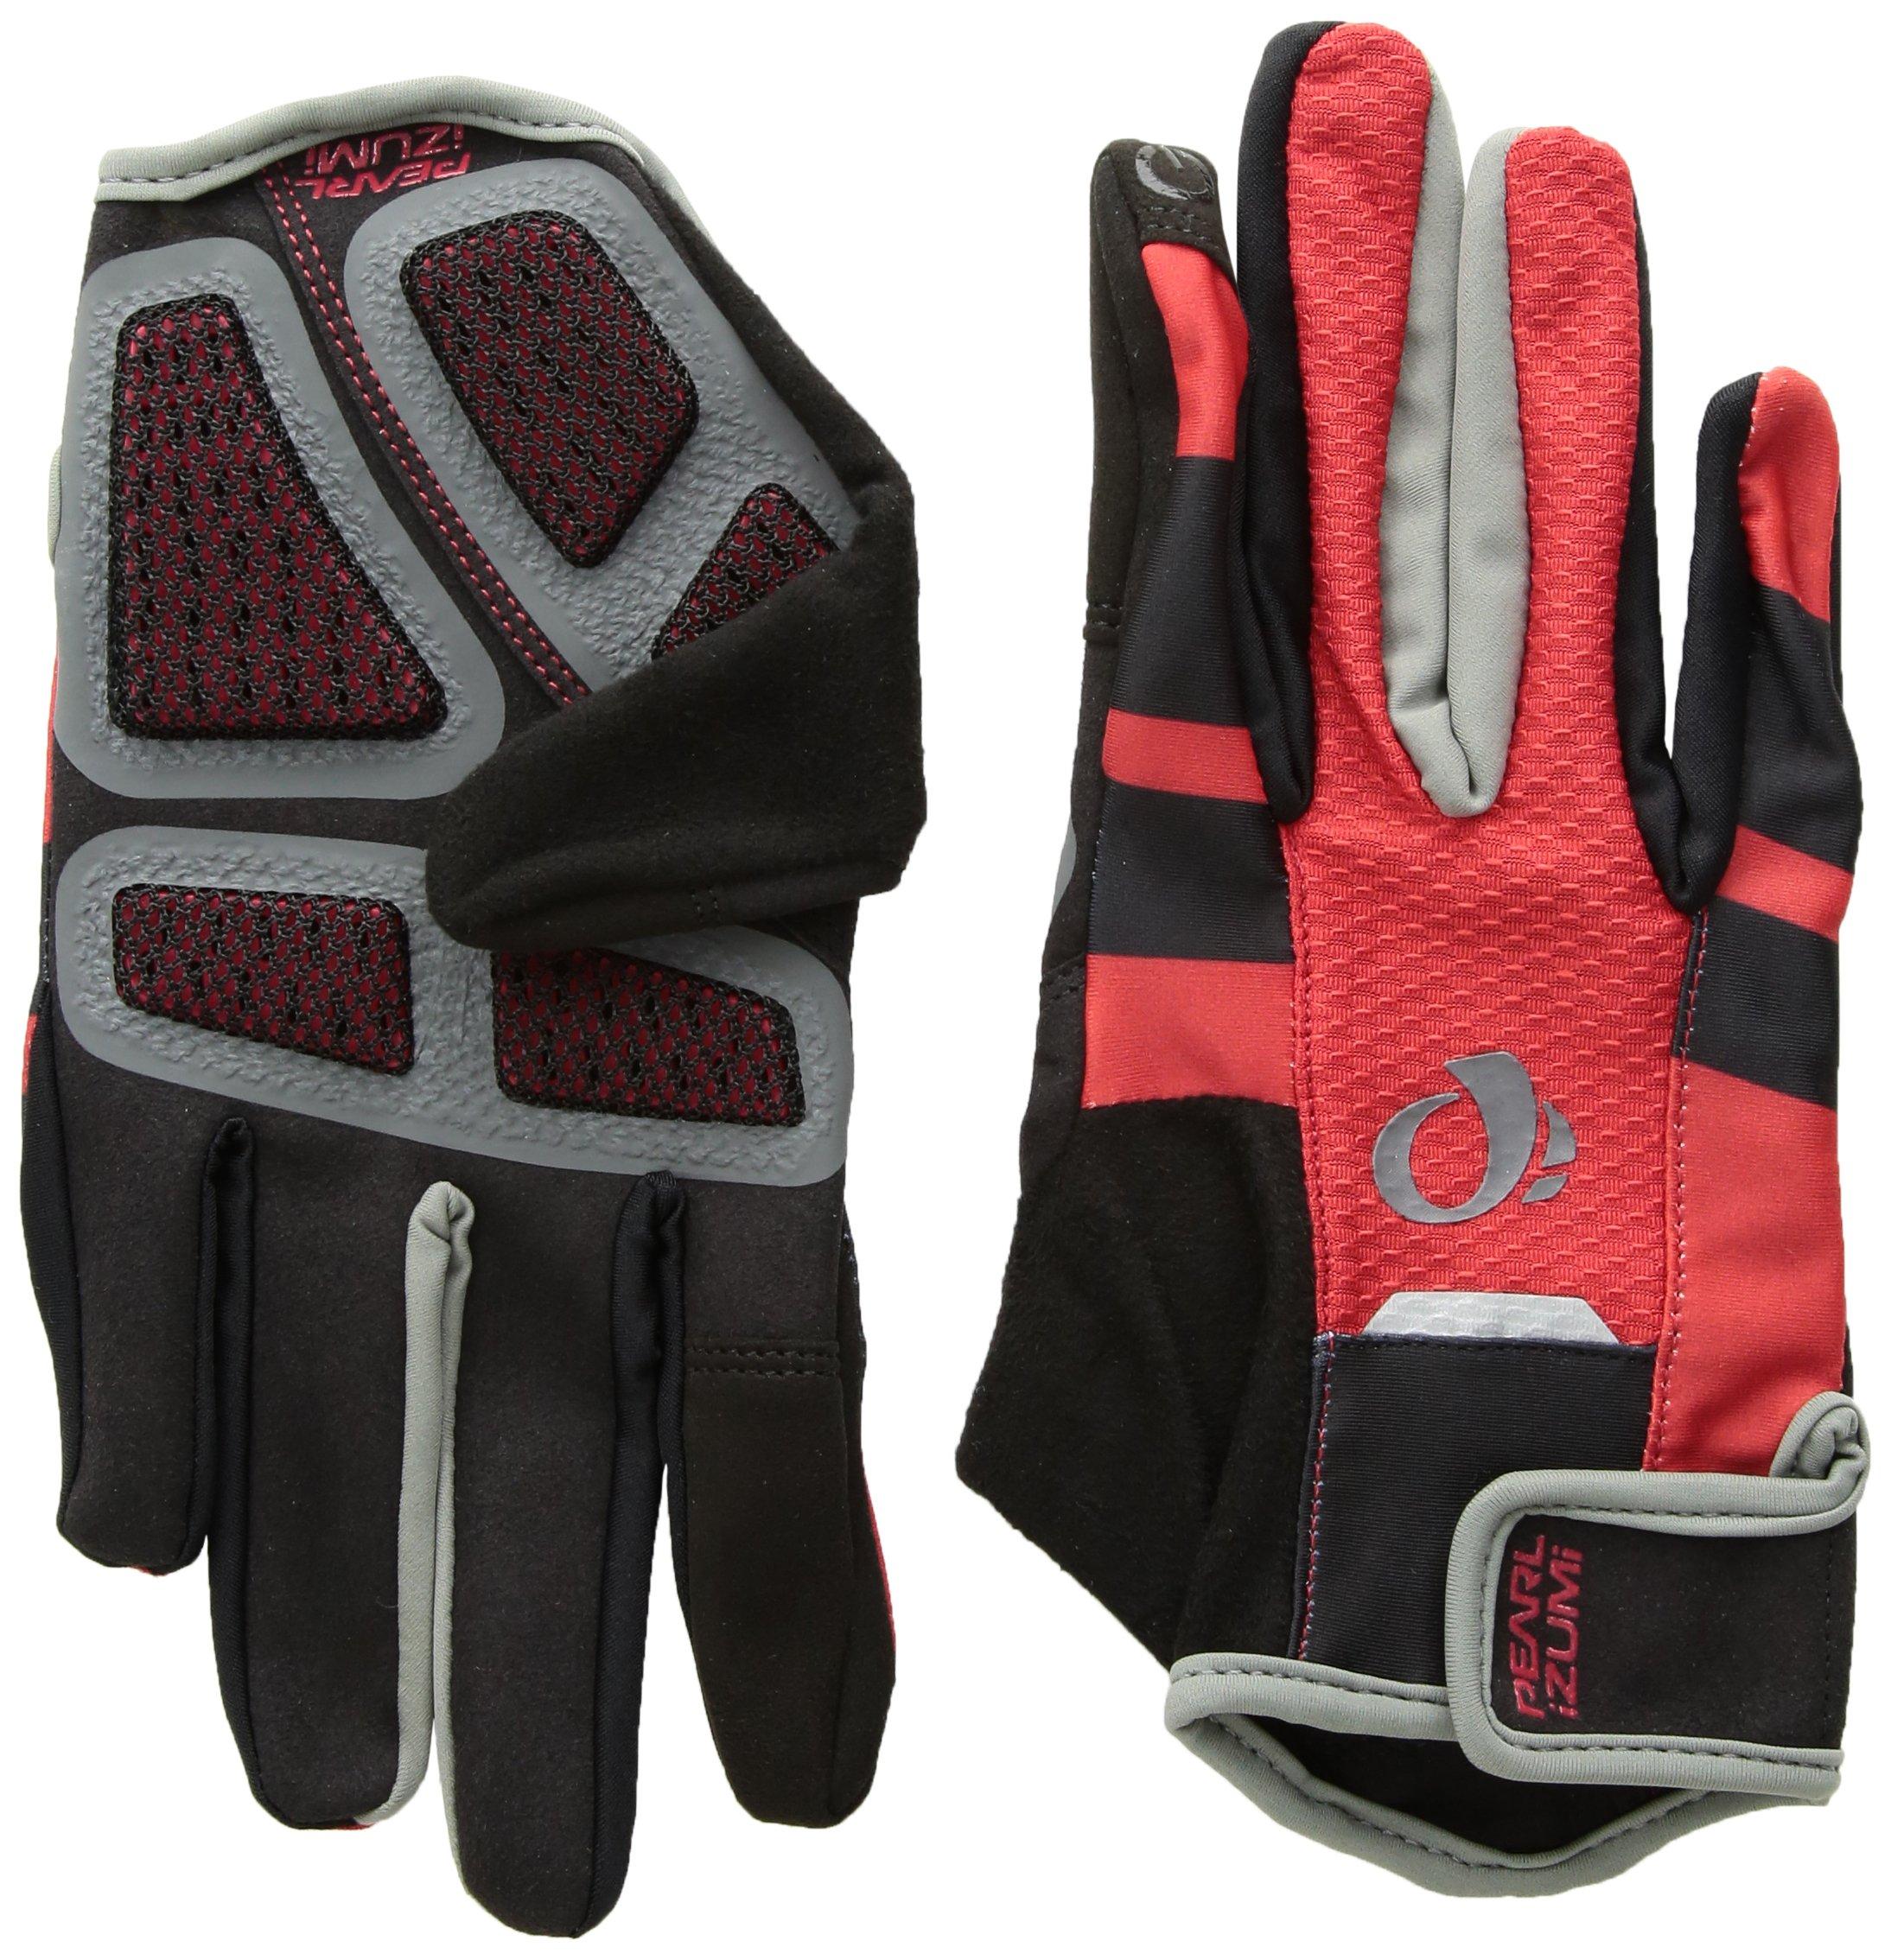 PEARL iZUMi PRO Gel Vent Full Finger Glove, Rogue Red, Small by Pearl Izumi - Ride